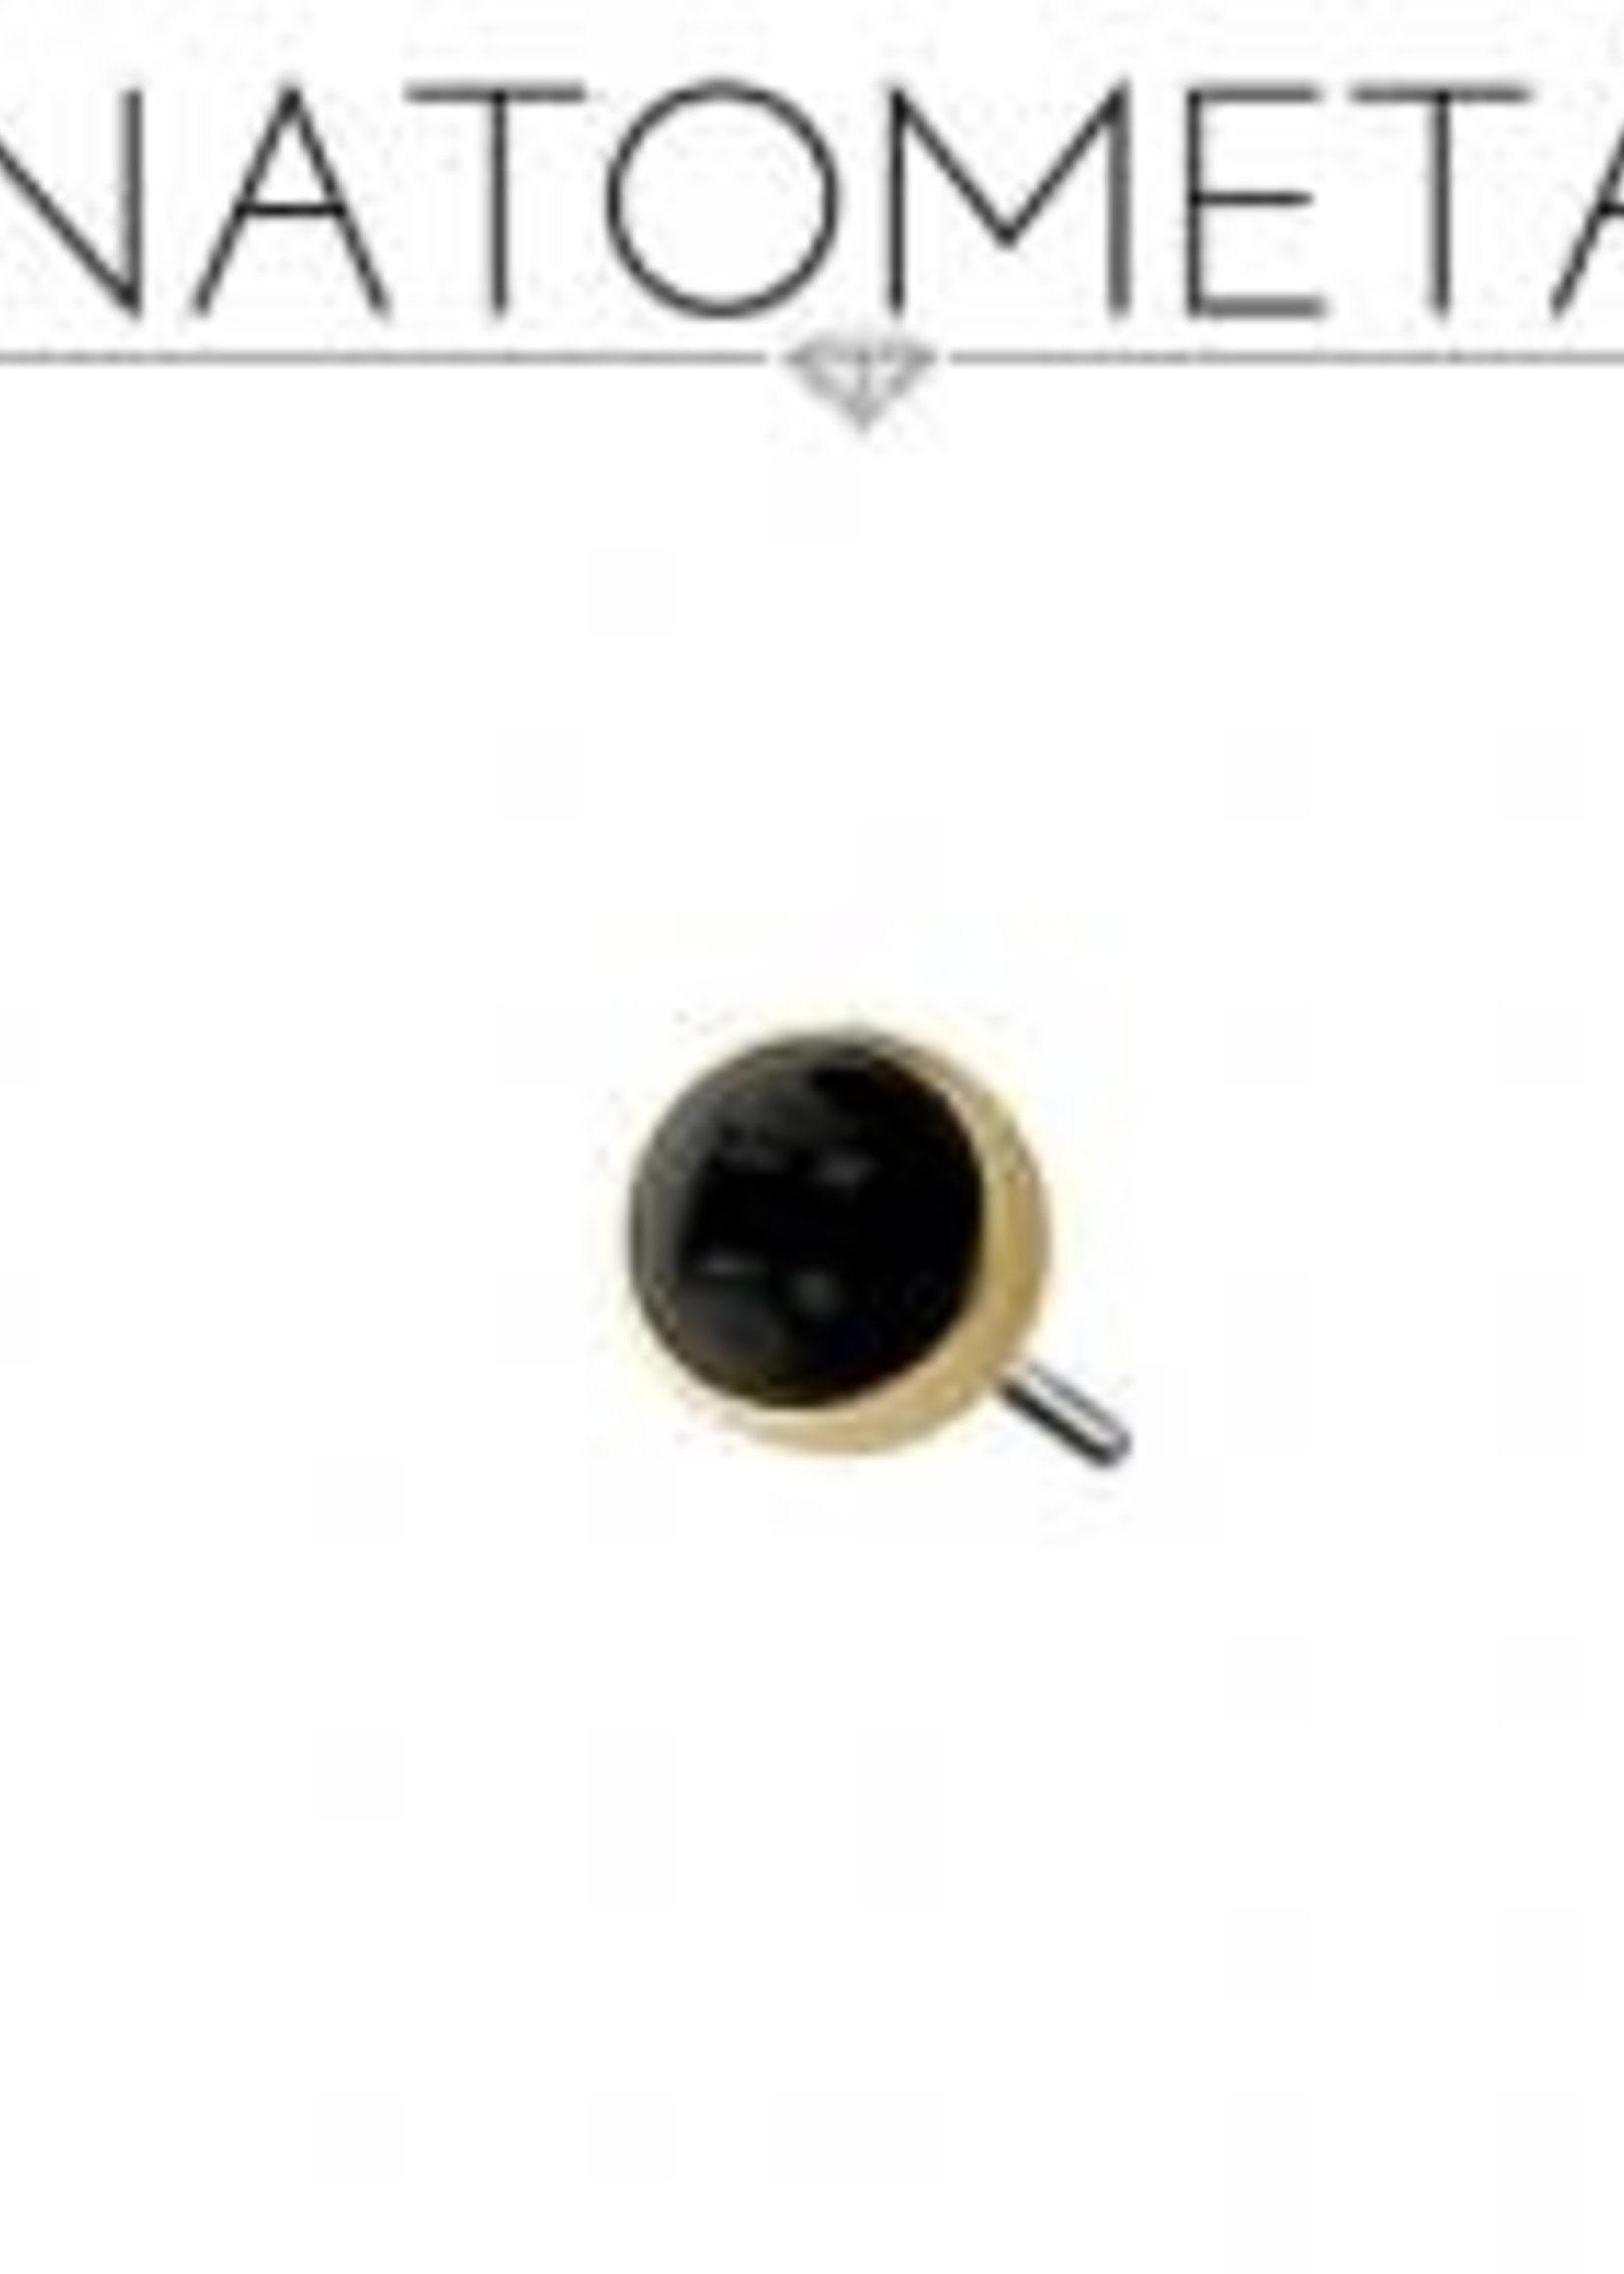 18k 5mm YG Bezel Threadless Pin